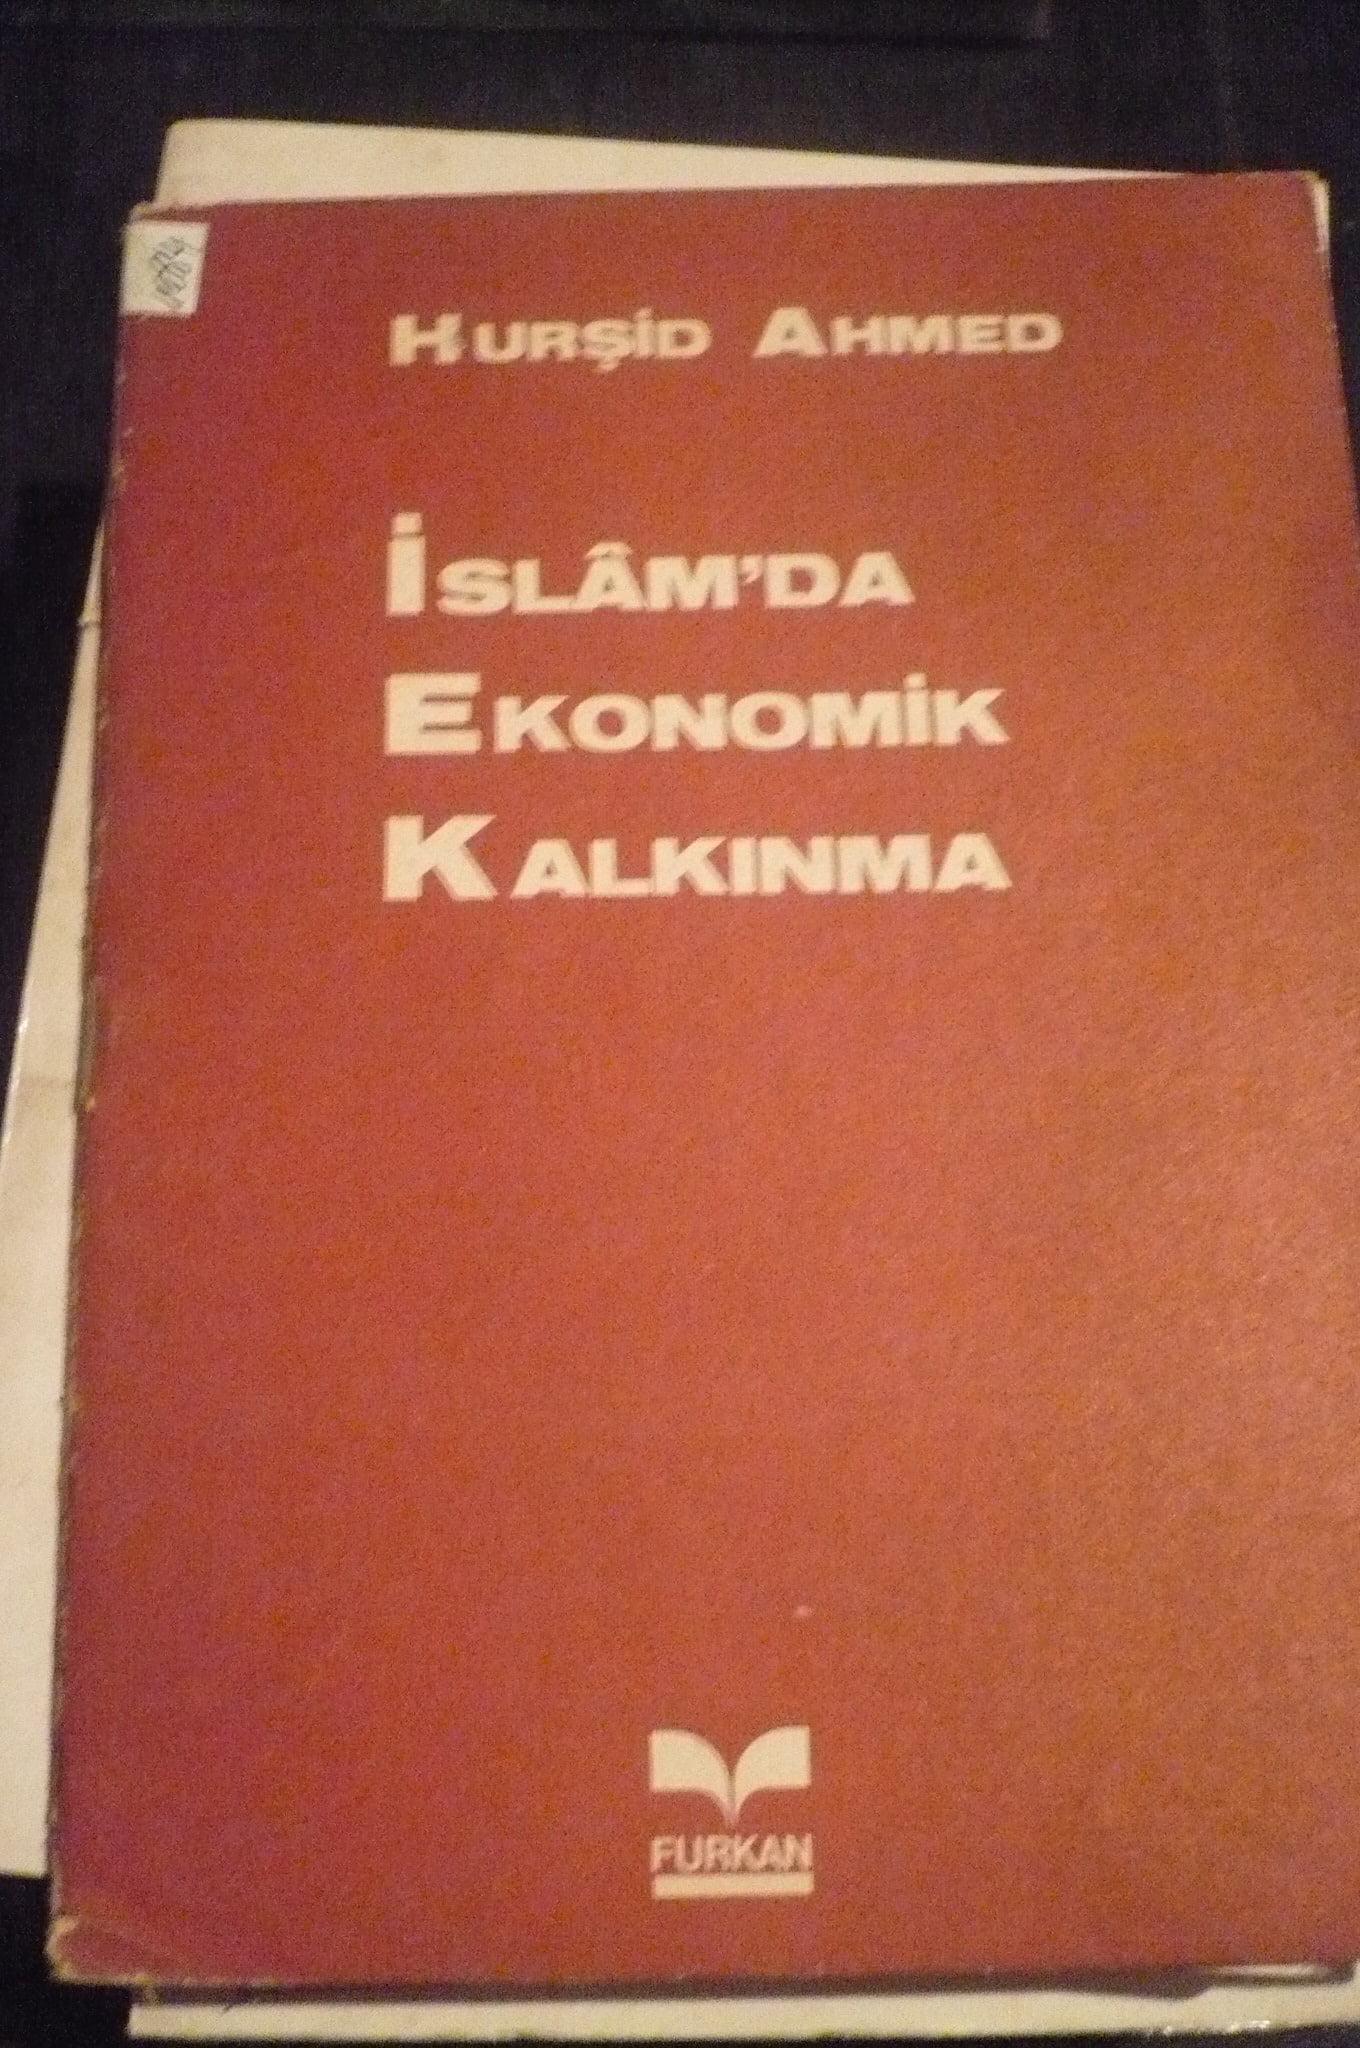 İSLAMDA EKONOMİK KALKINMA/Hurşid Ahmed/10 tl